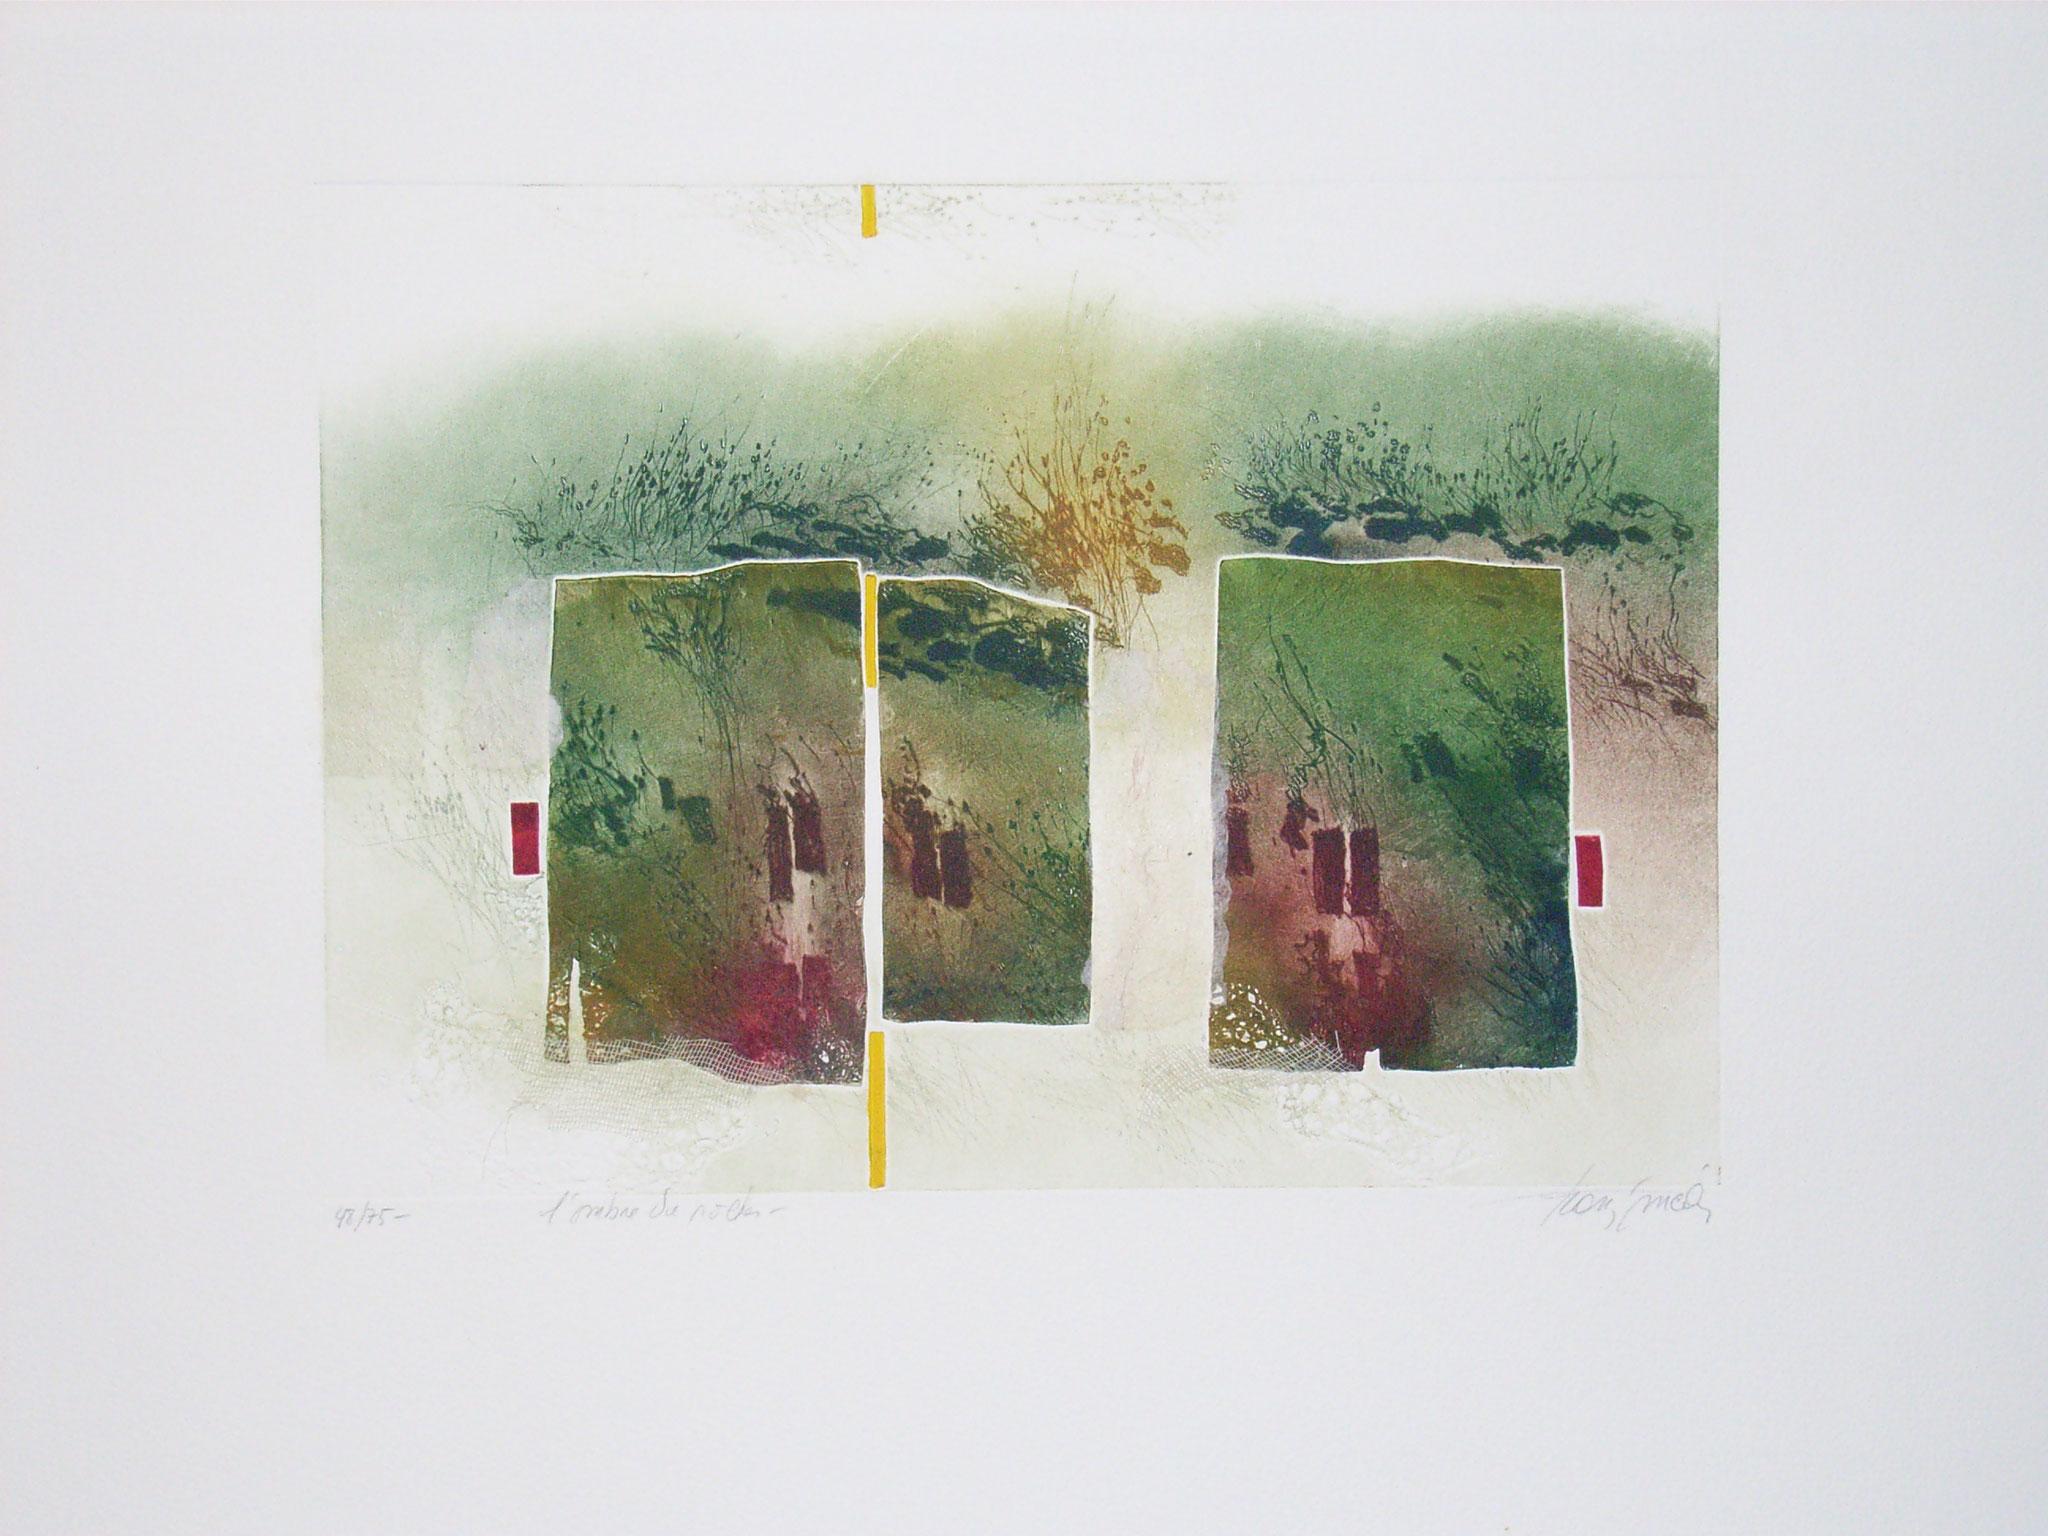 Francis Man, Radierung, Größe/Falzmaß: 60x50, 375,-€